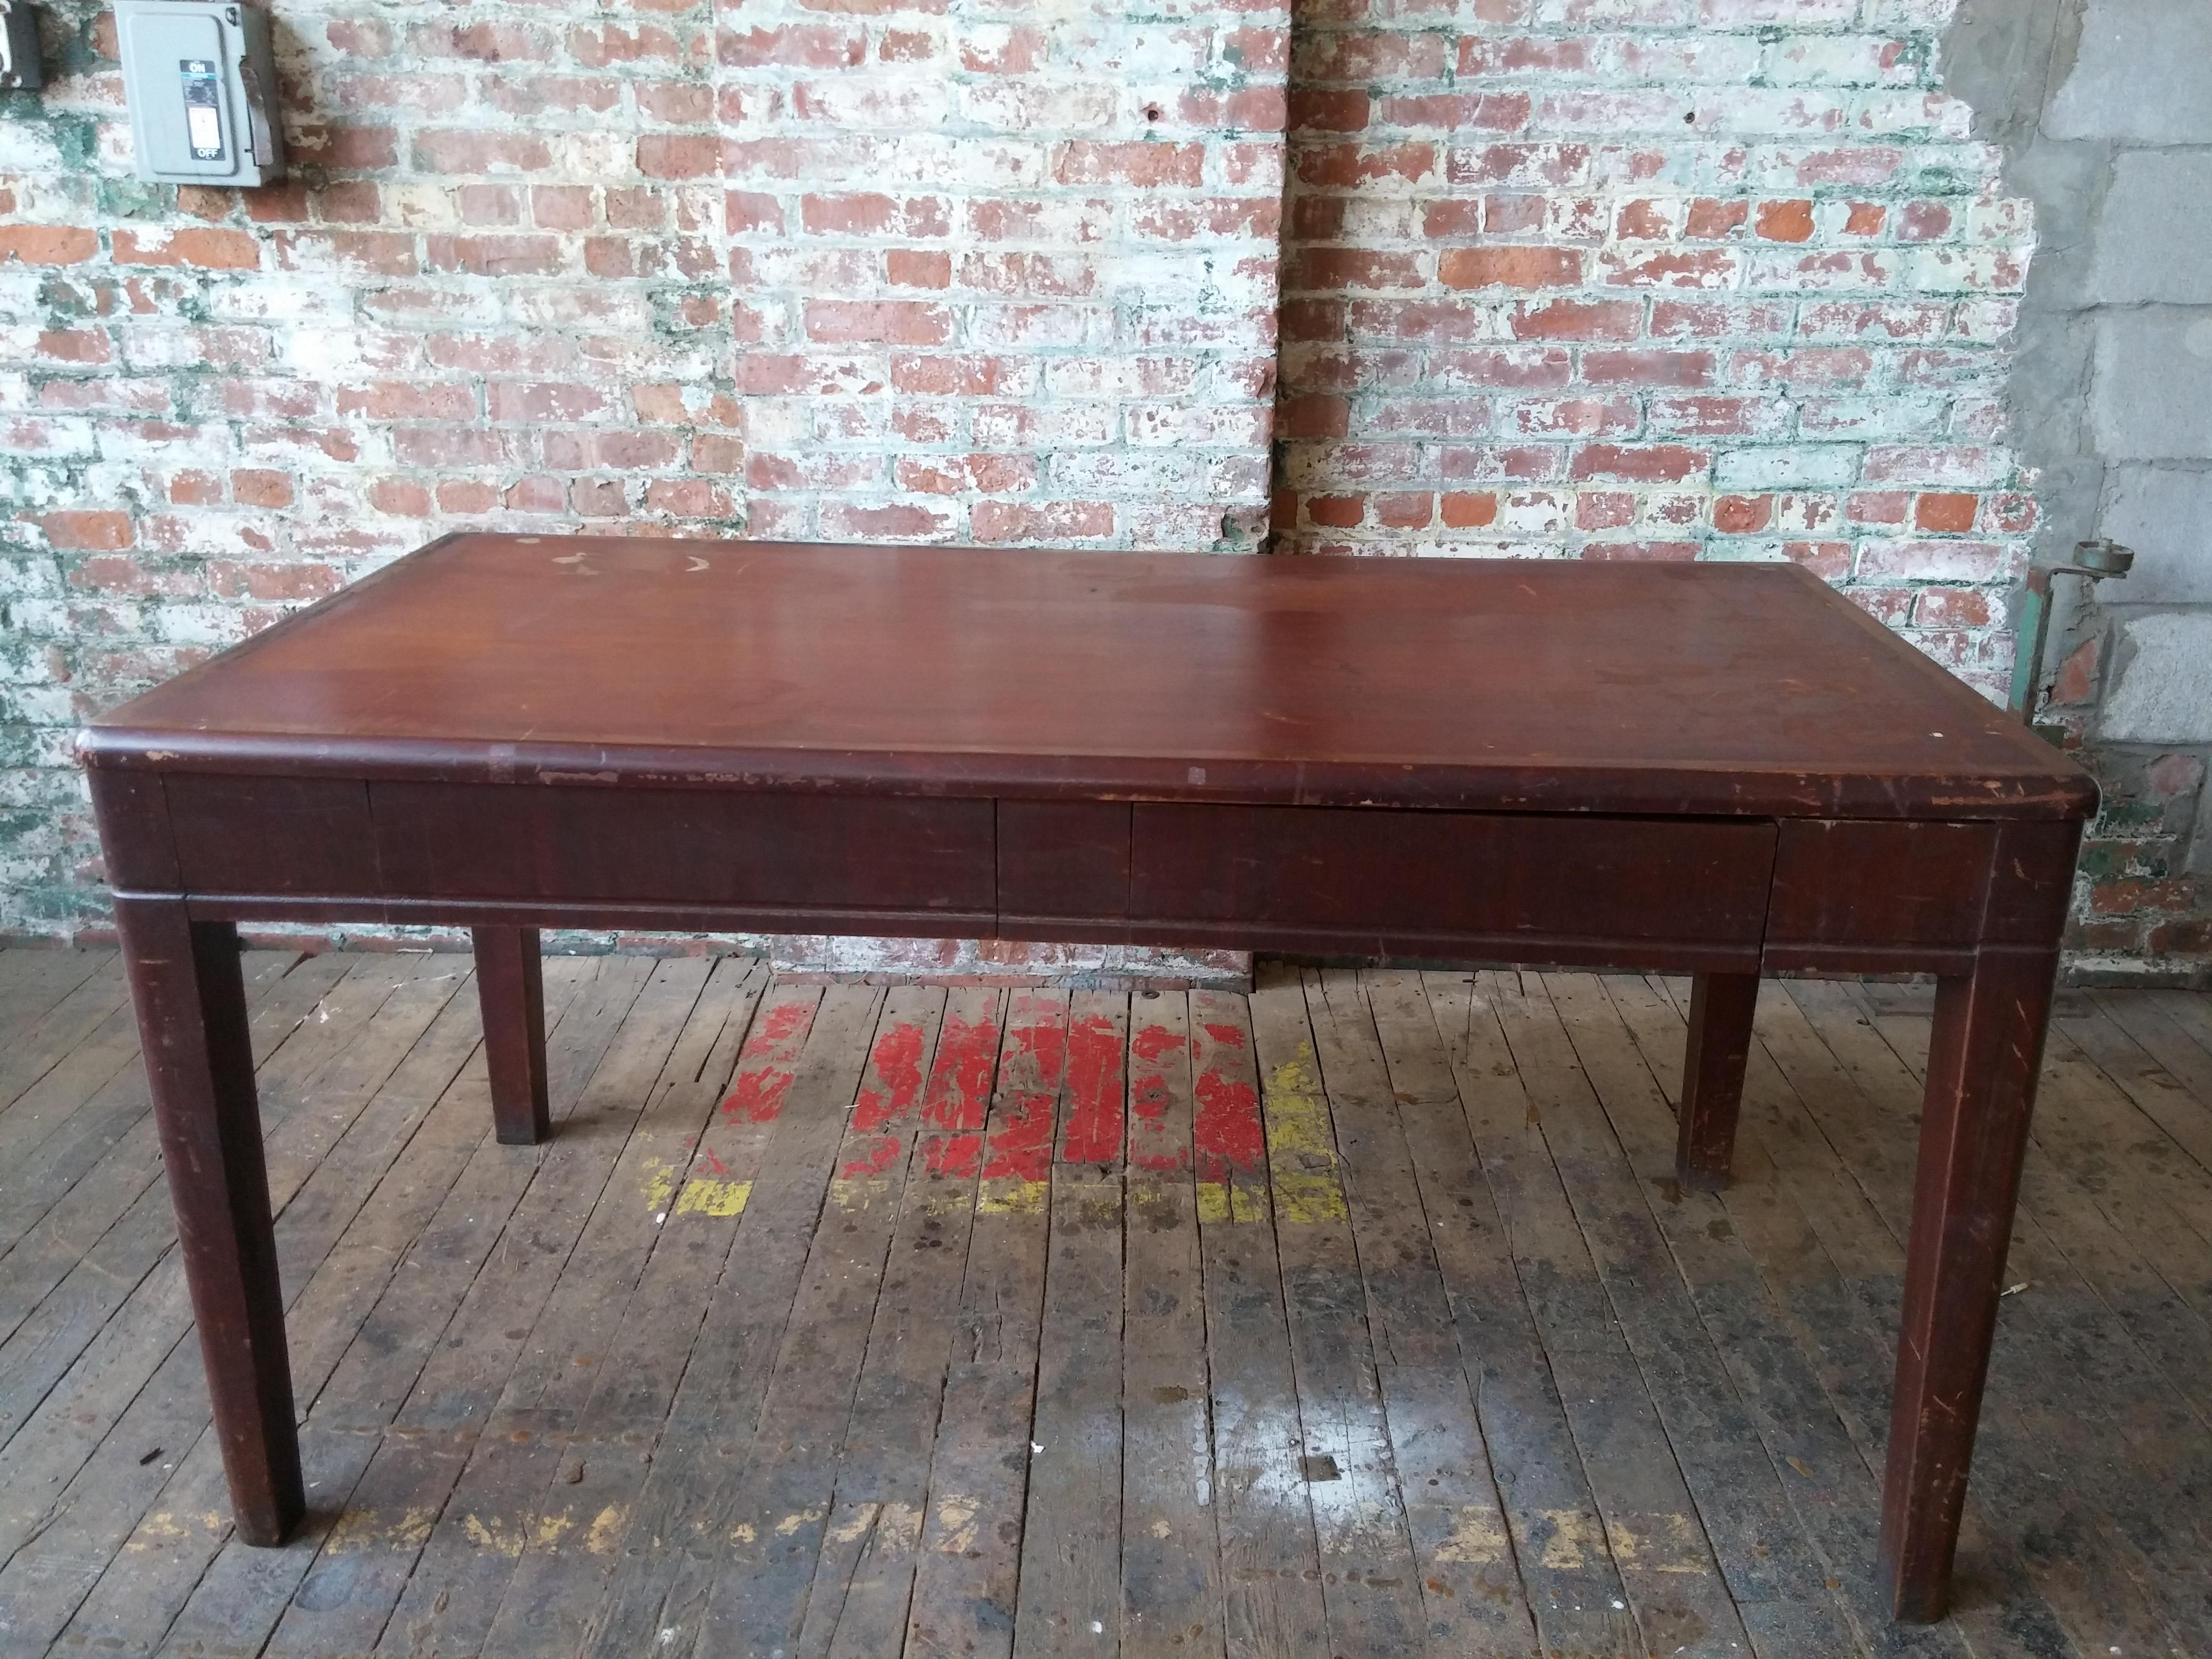 198 B. 30' X 60' Table